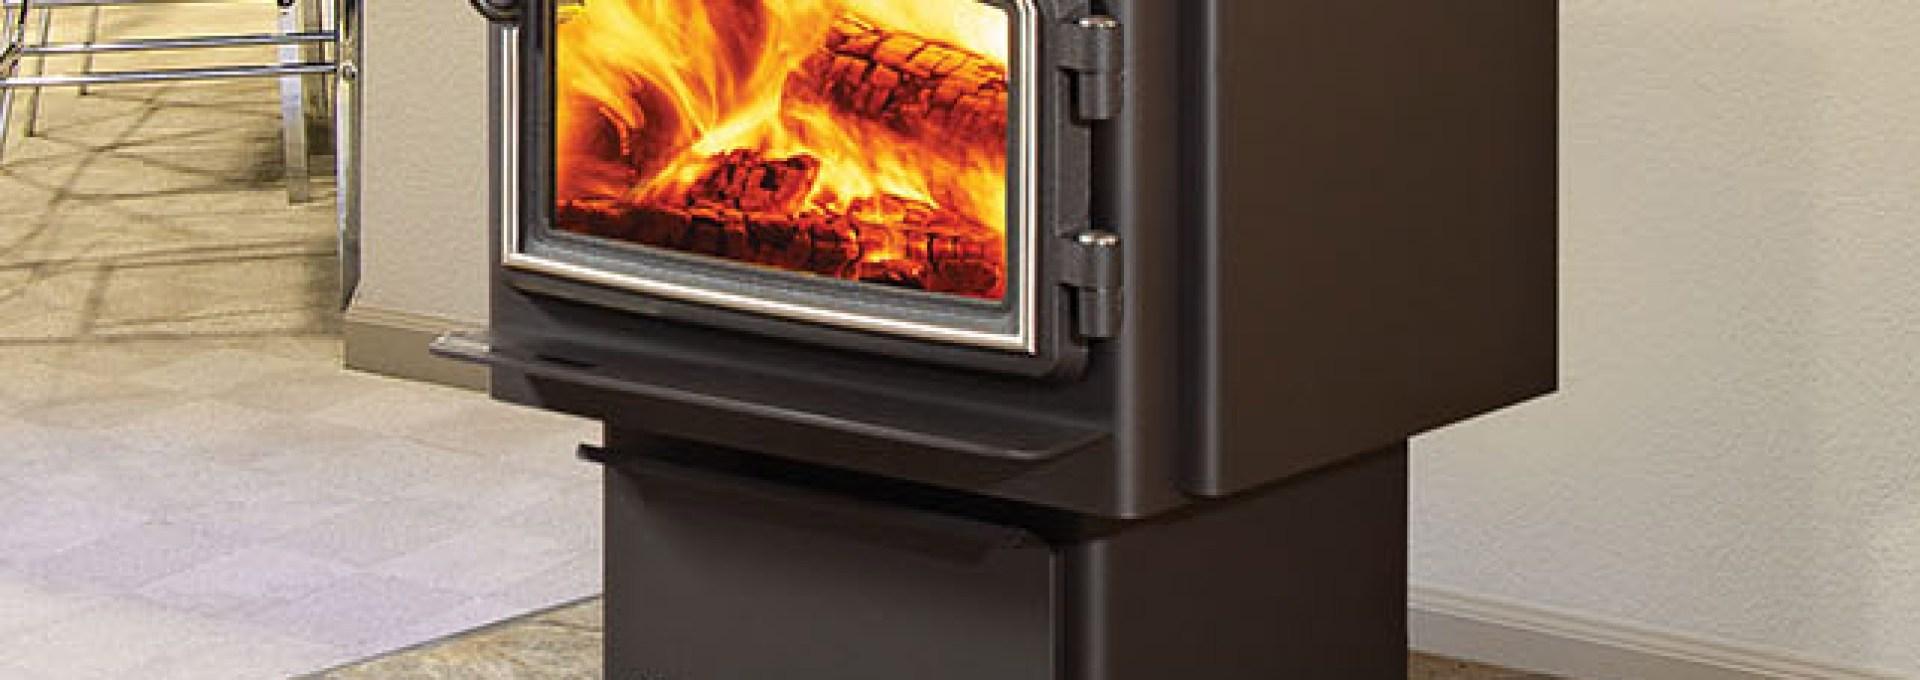 Wood Burning Stove Vs Pellet Stove Gaithersburg Md Fireplace Service